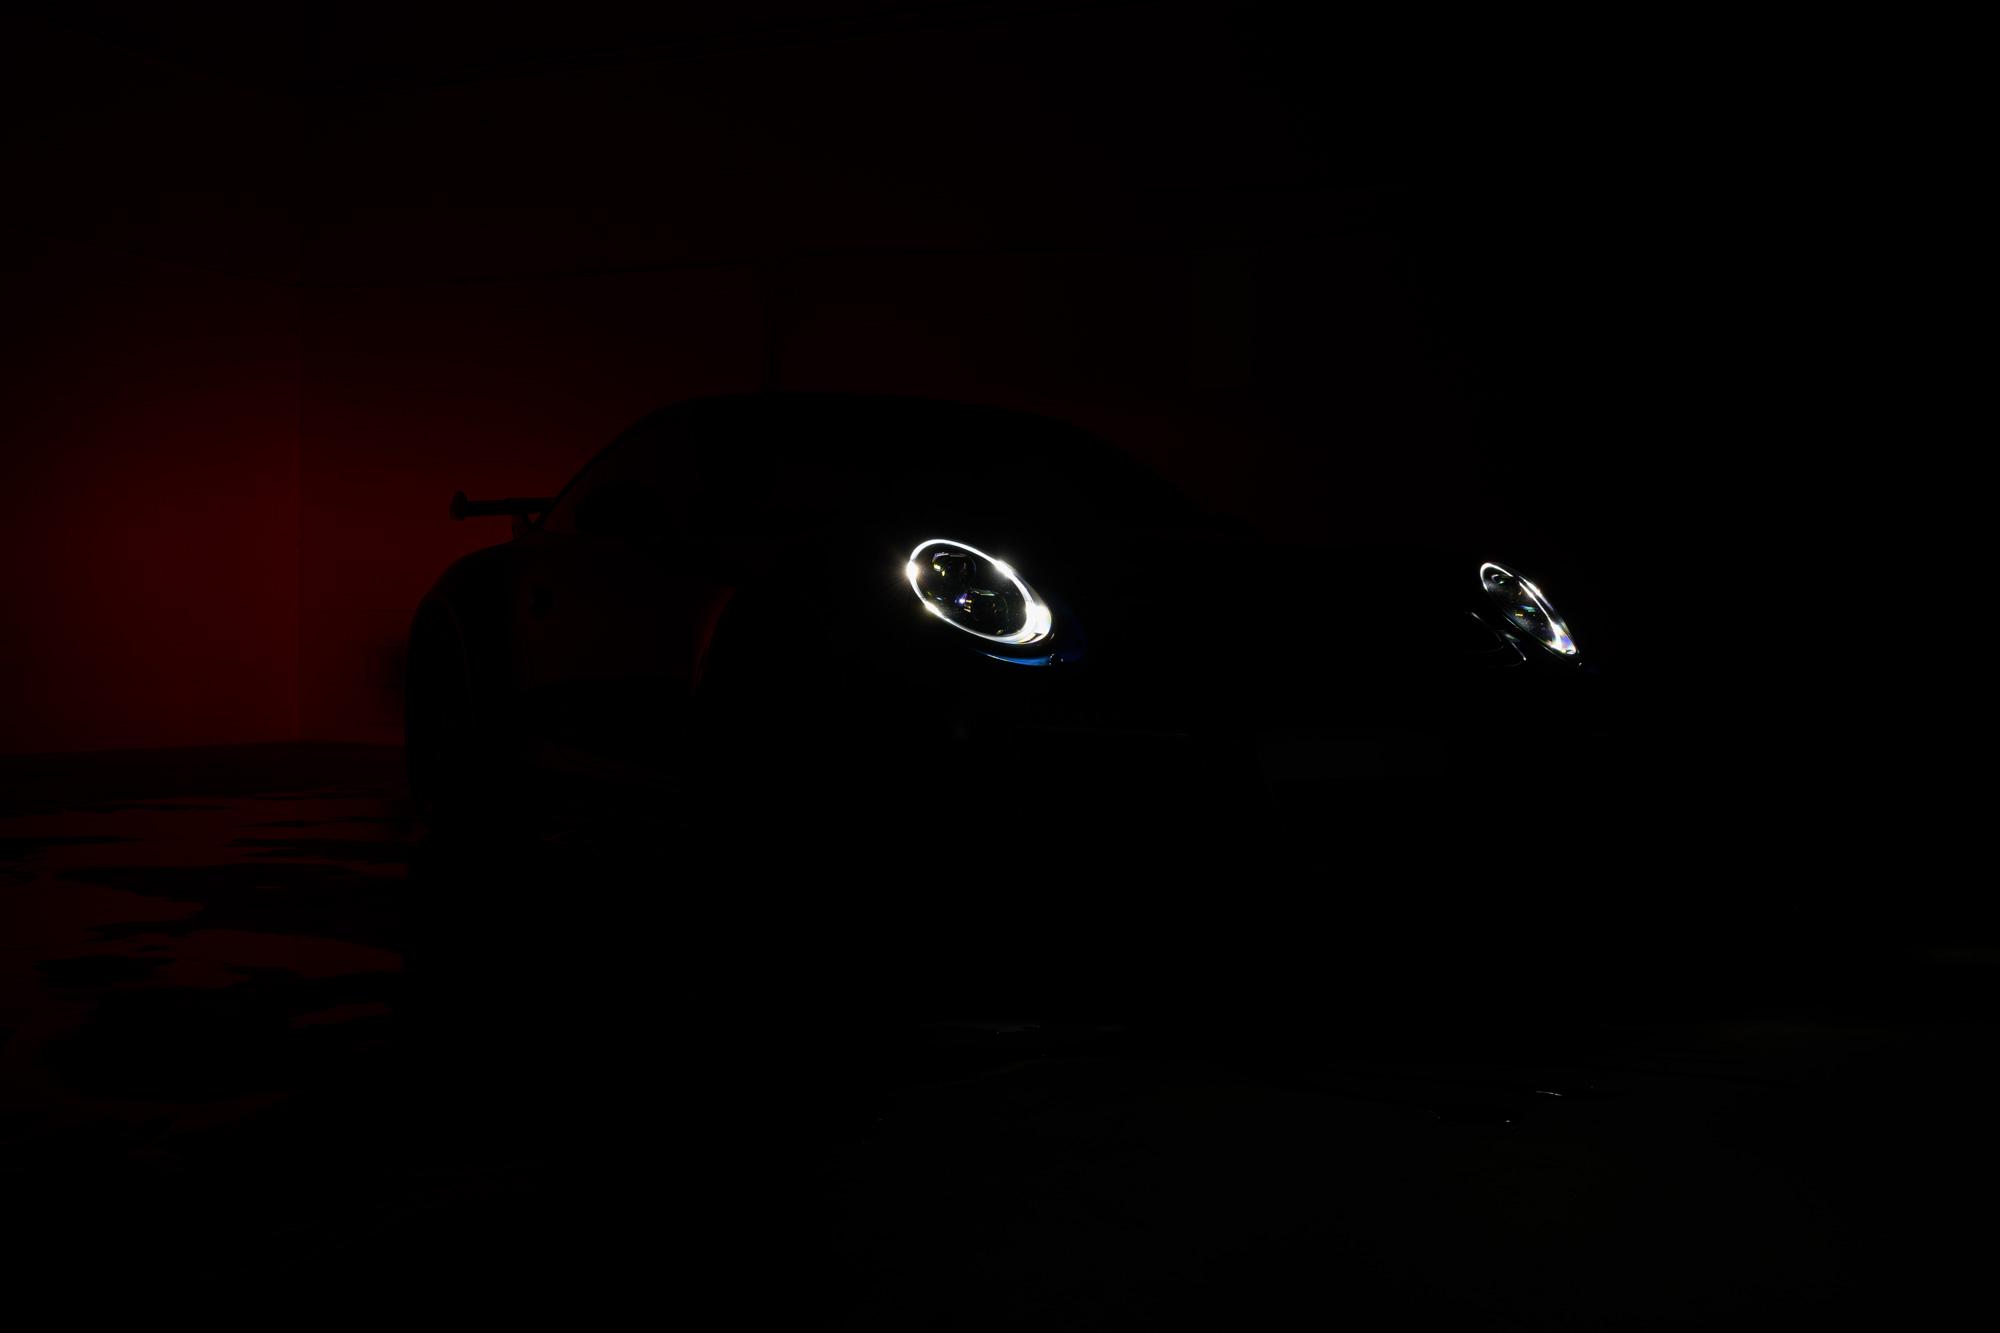 911 GT3 parking lights